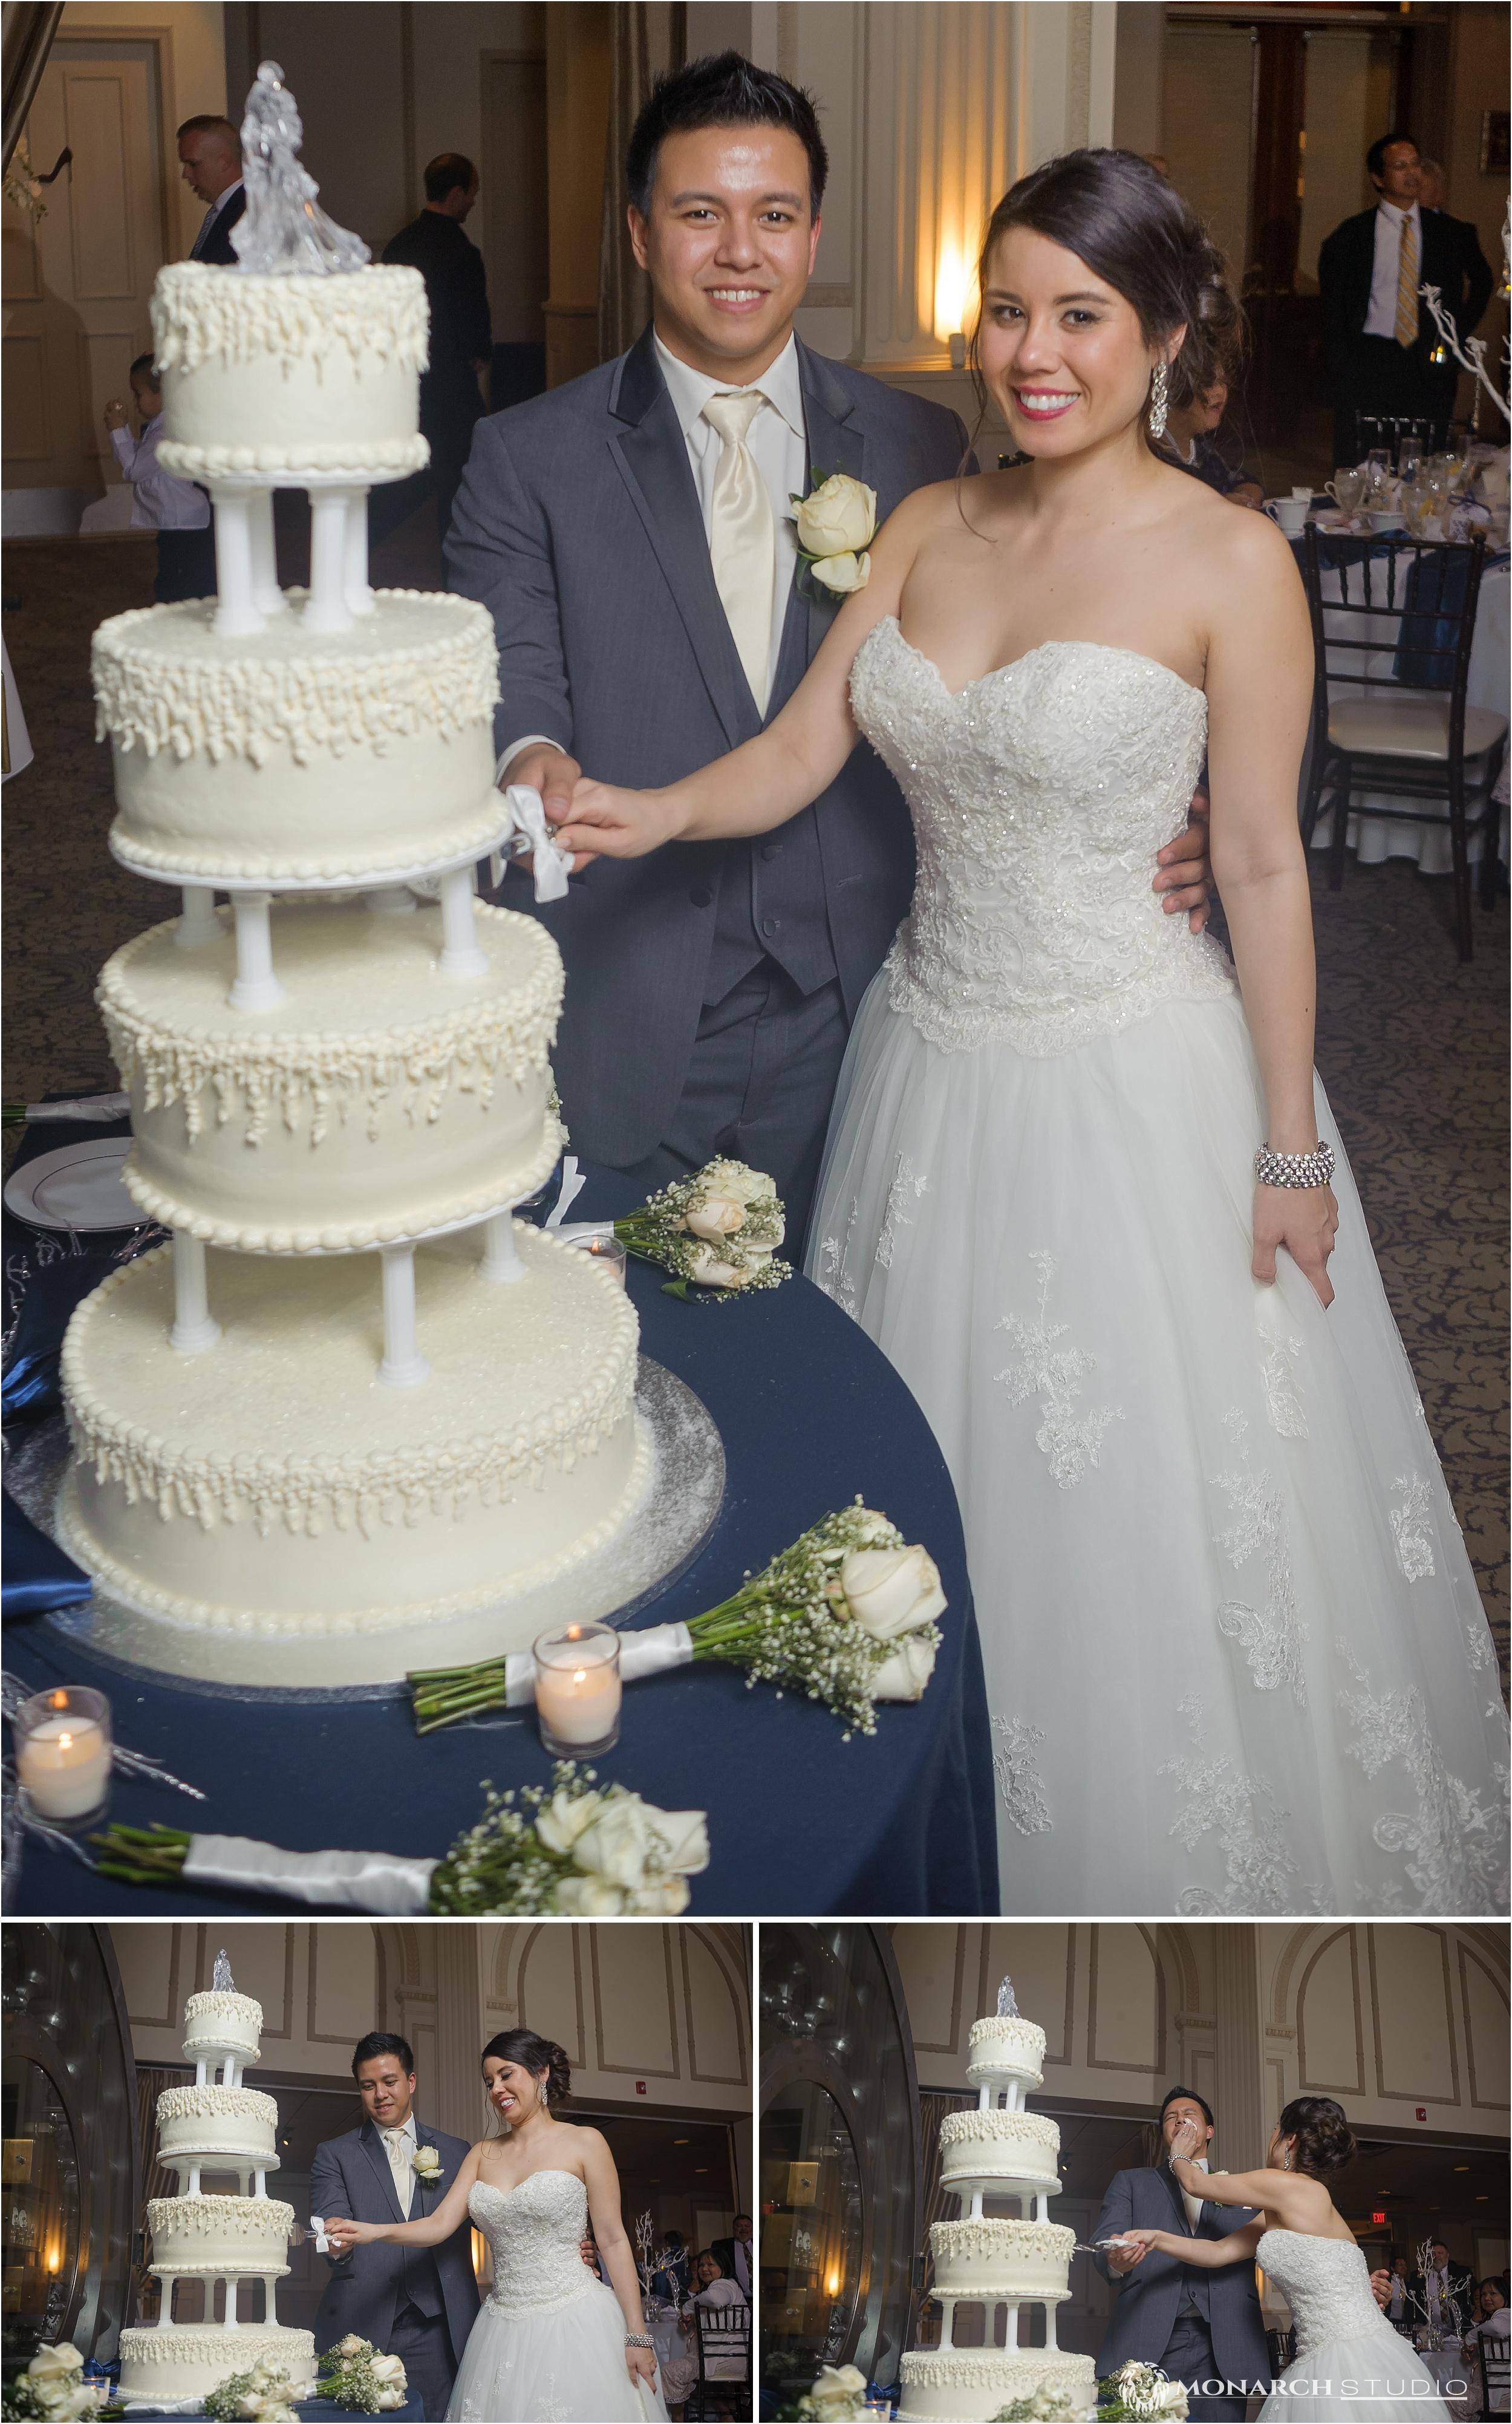 wedding-photographer-in-st-augustine-florida-treasury-099.jpg